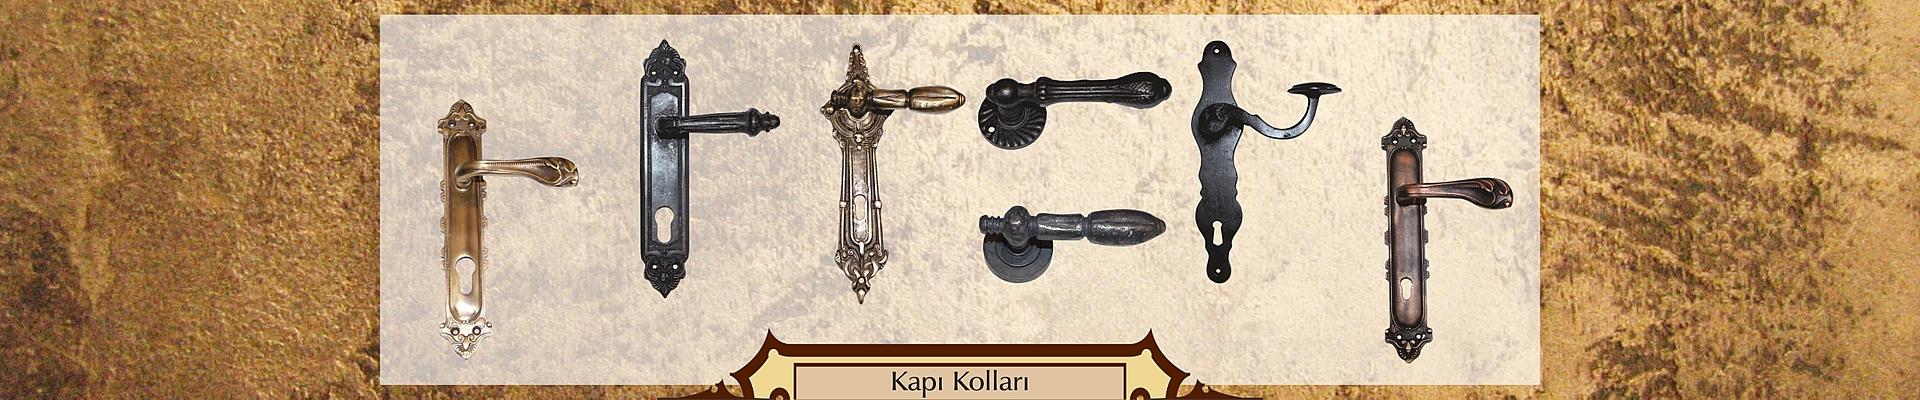 Kapı Kolu Baner1